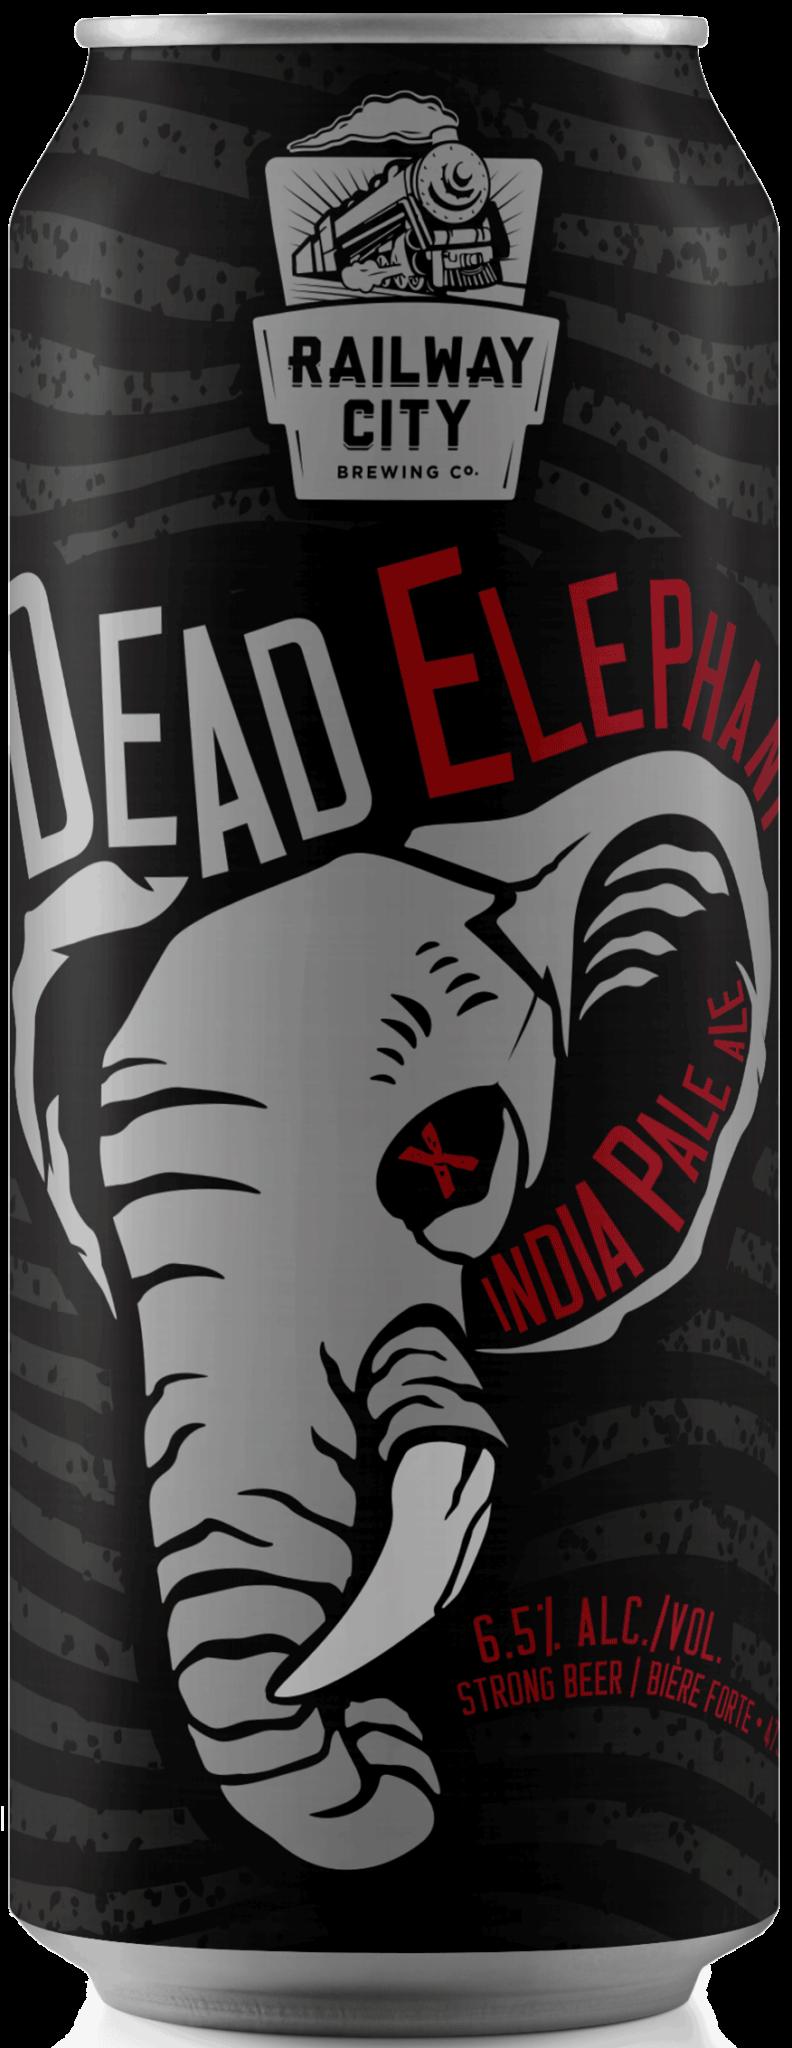 Dead-Elephant